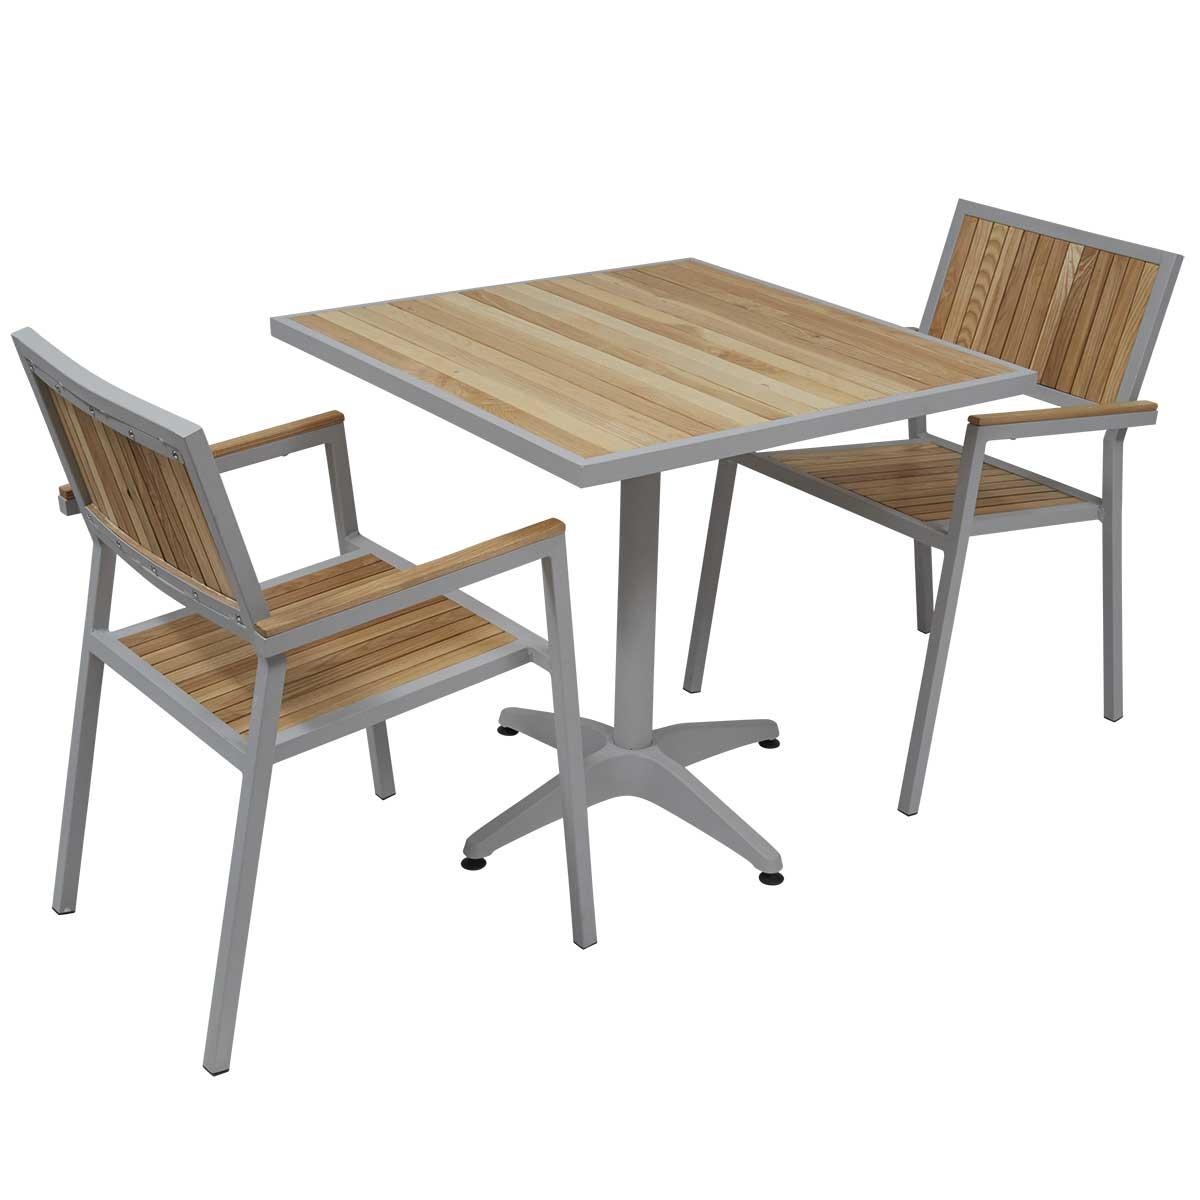 Table Jardin solde Beau Table Terrasse Pas Cher Of 34 Frais Table Jardin solde